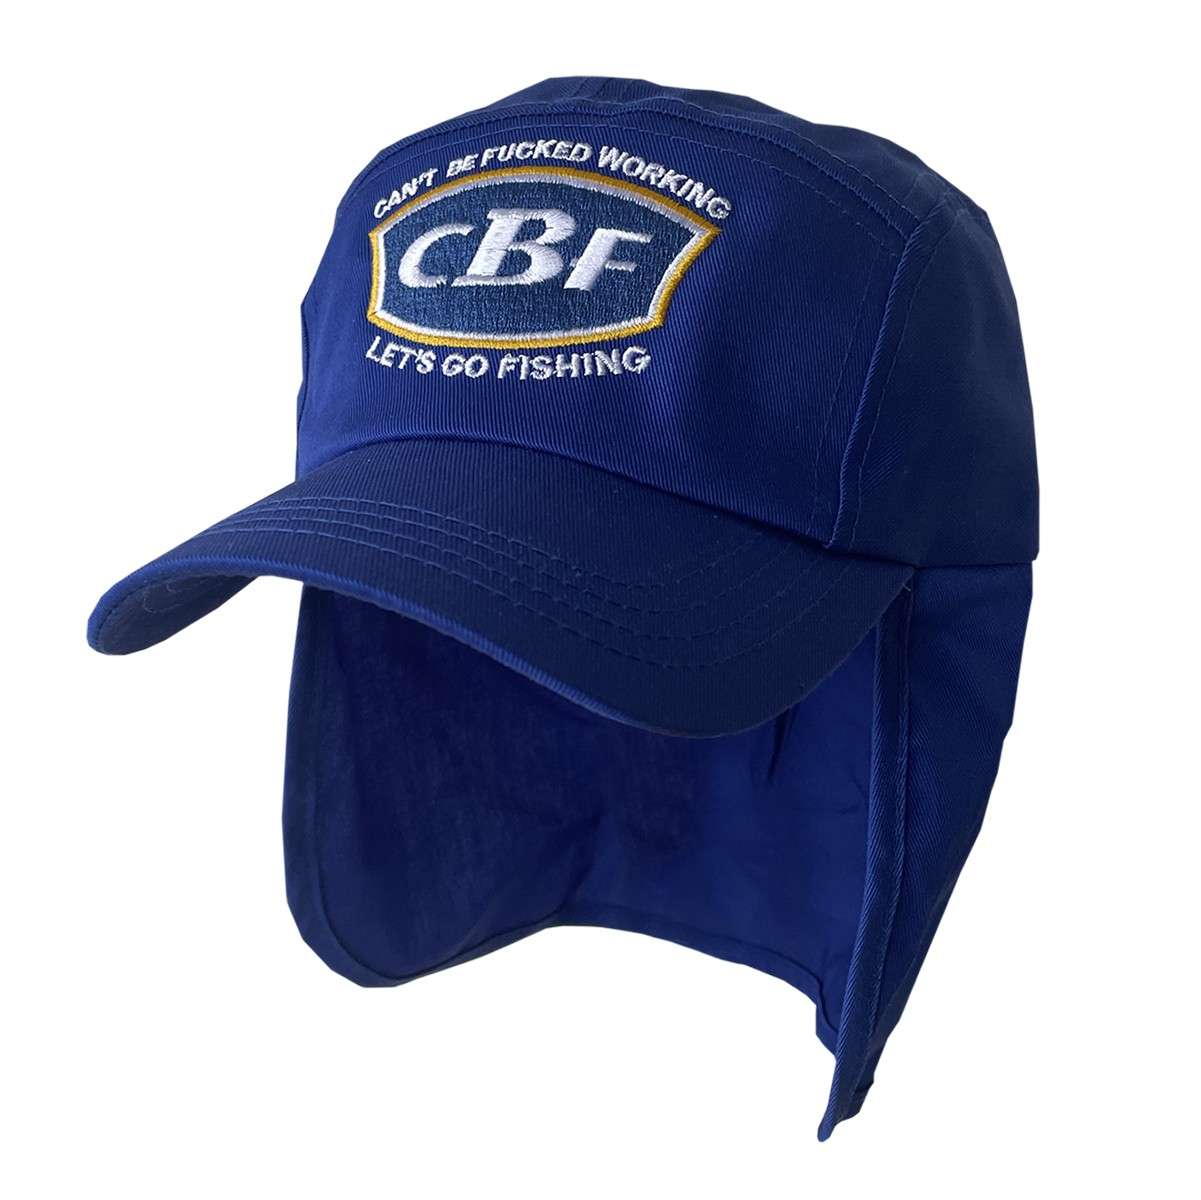 CAN'T BE F'D PARODY BLUE LEGIONNAIRES HAT